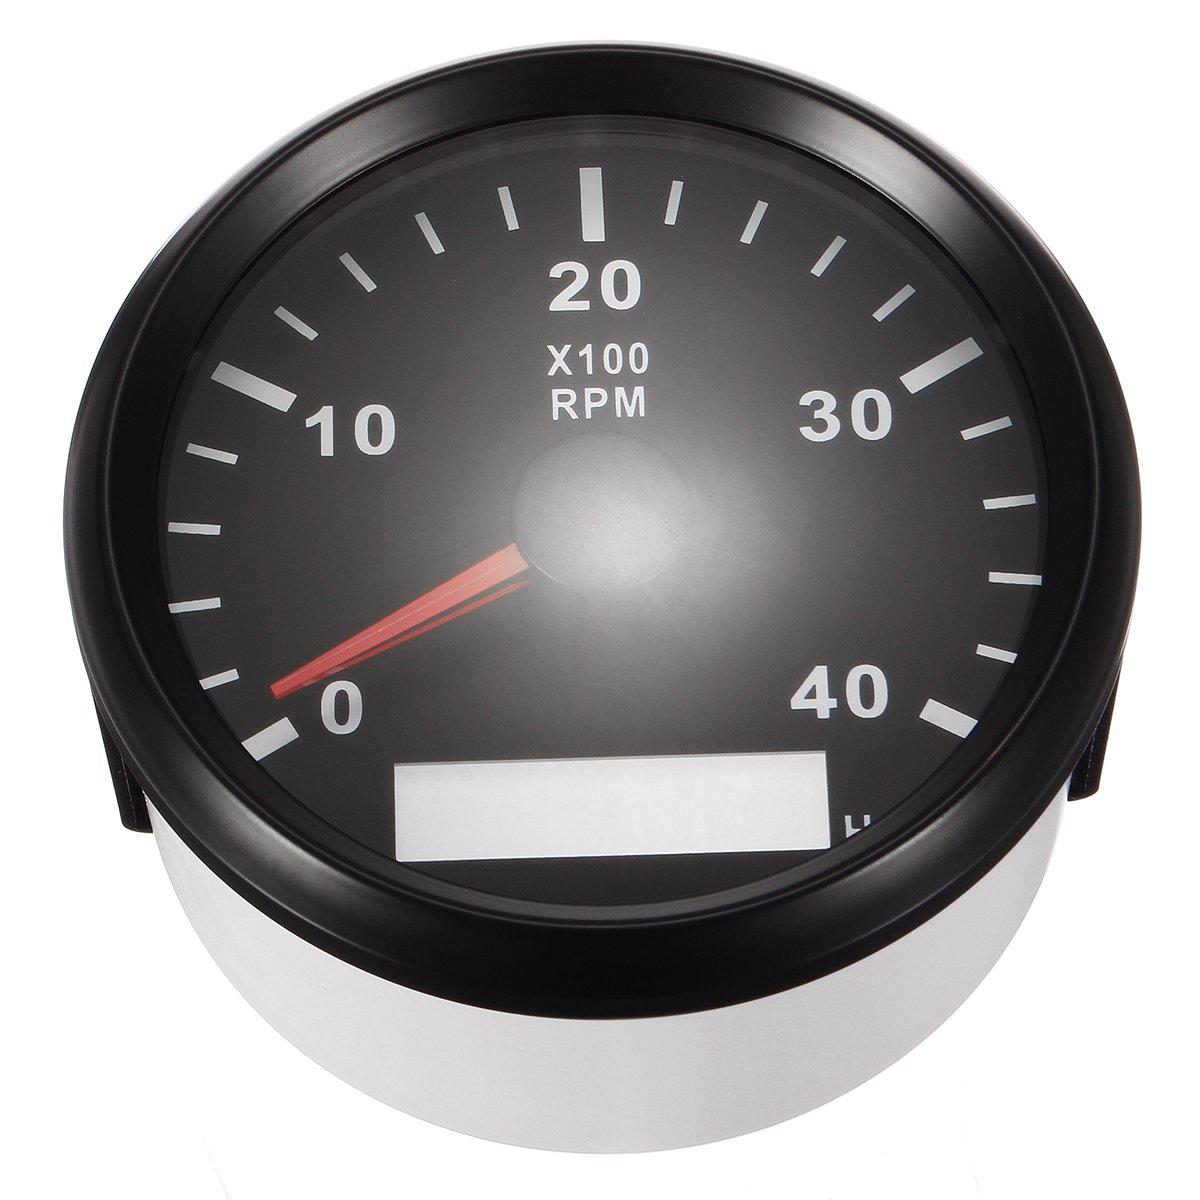 NeDonald 12/24V Marine Tachometer Boat Tacho Meter Gauge LCD Hourmeter 0-4000 RPM 85mm